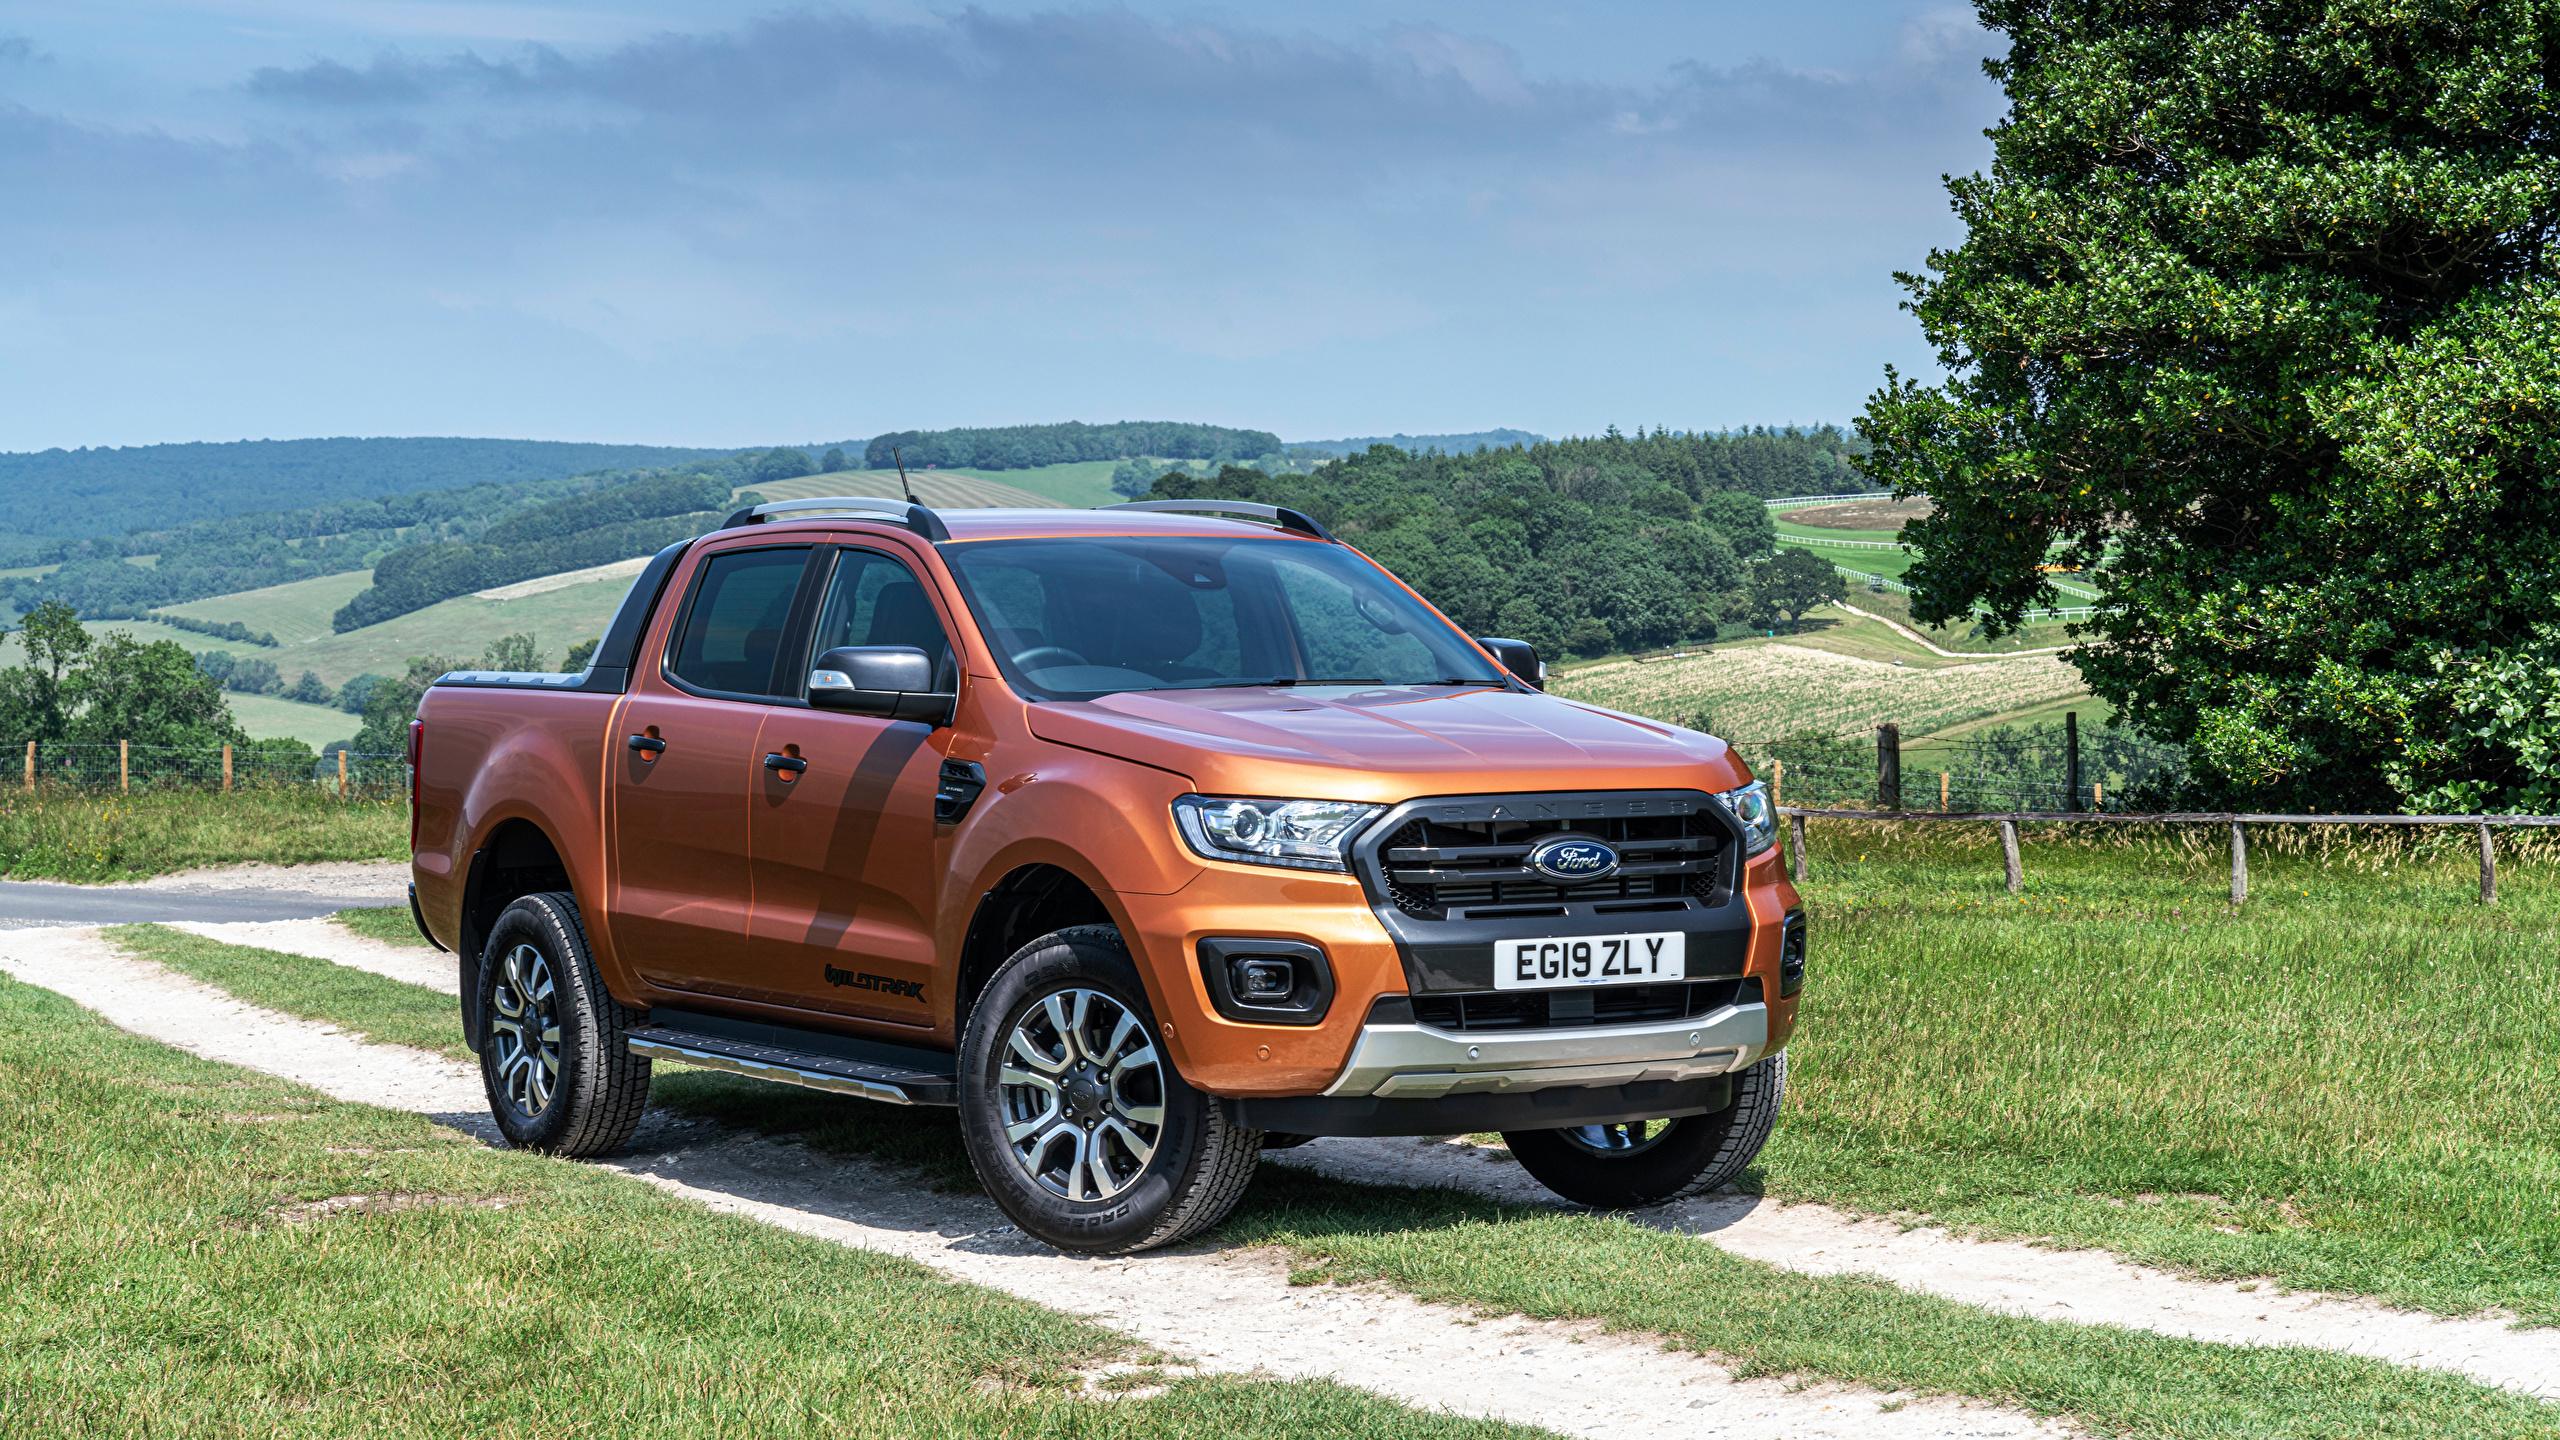 Картинка Форд Ranger Wildtrak UK-spec, 2019-- Пикап кузов коричневая машина Металлик 2560x1440 Ford коричневые Коричневый авто машины Автомобили автомобиль